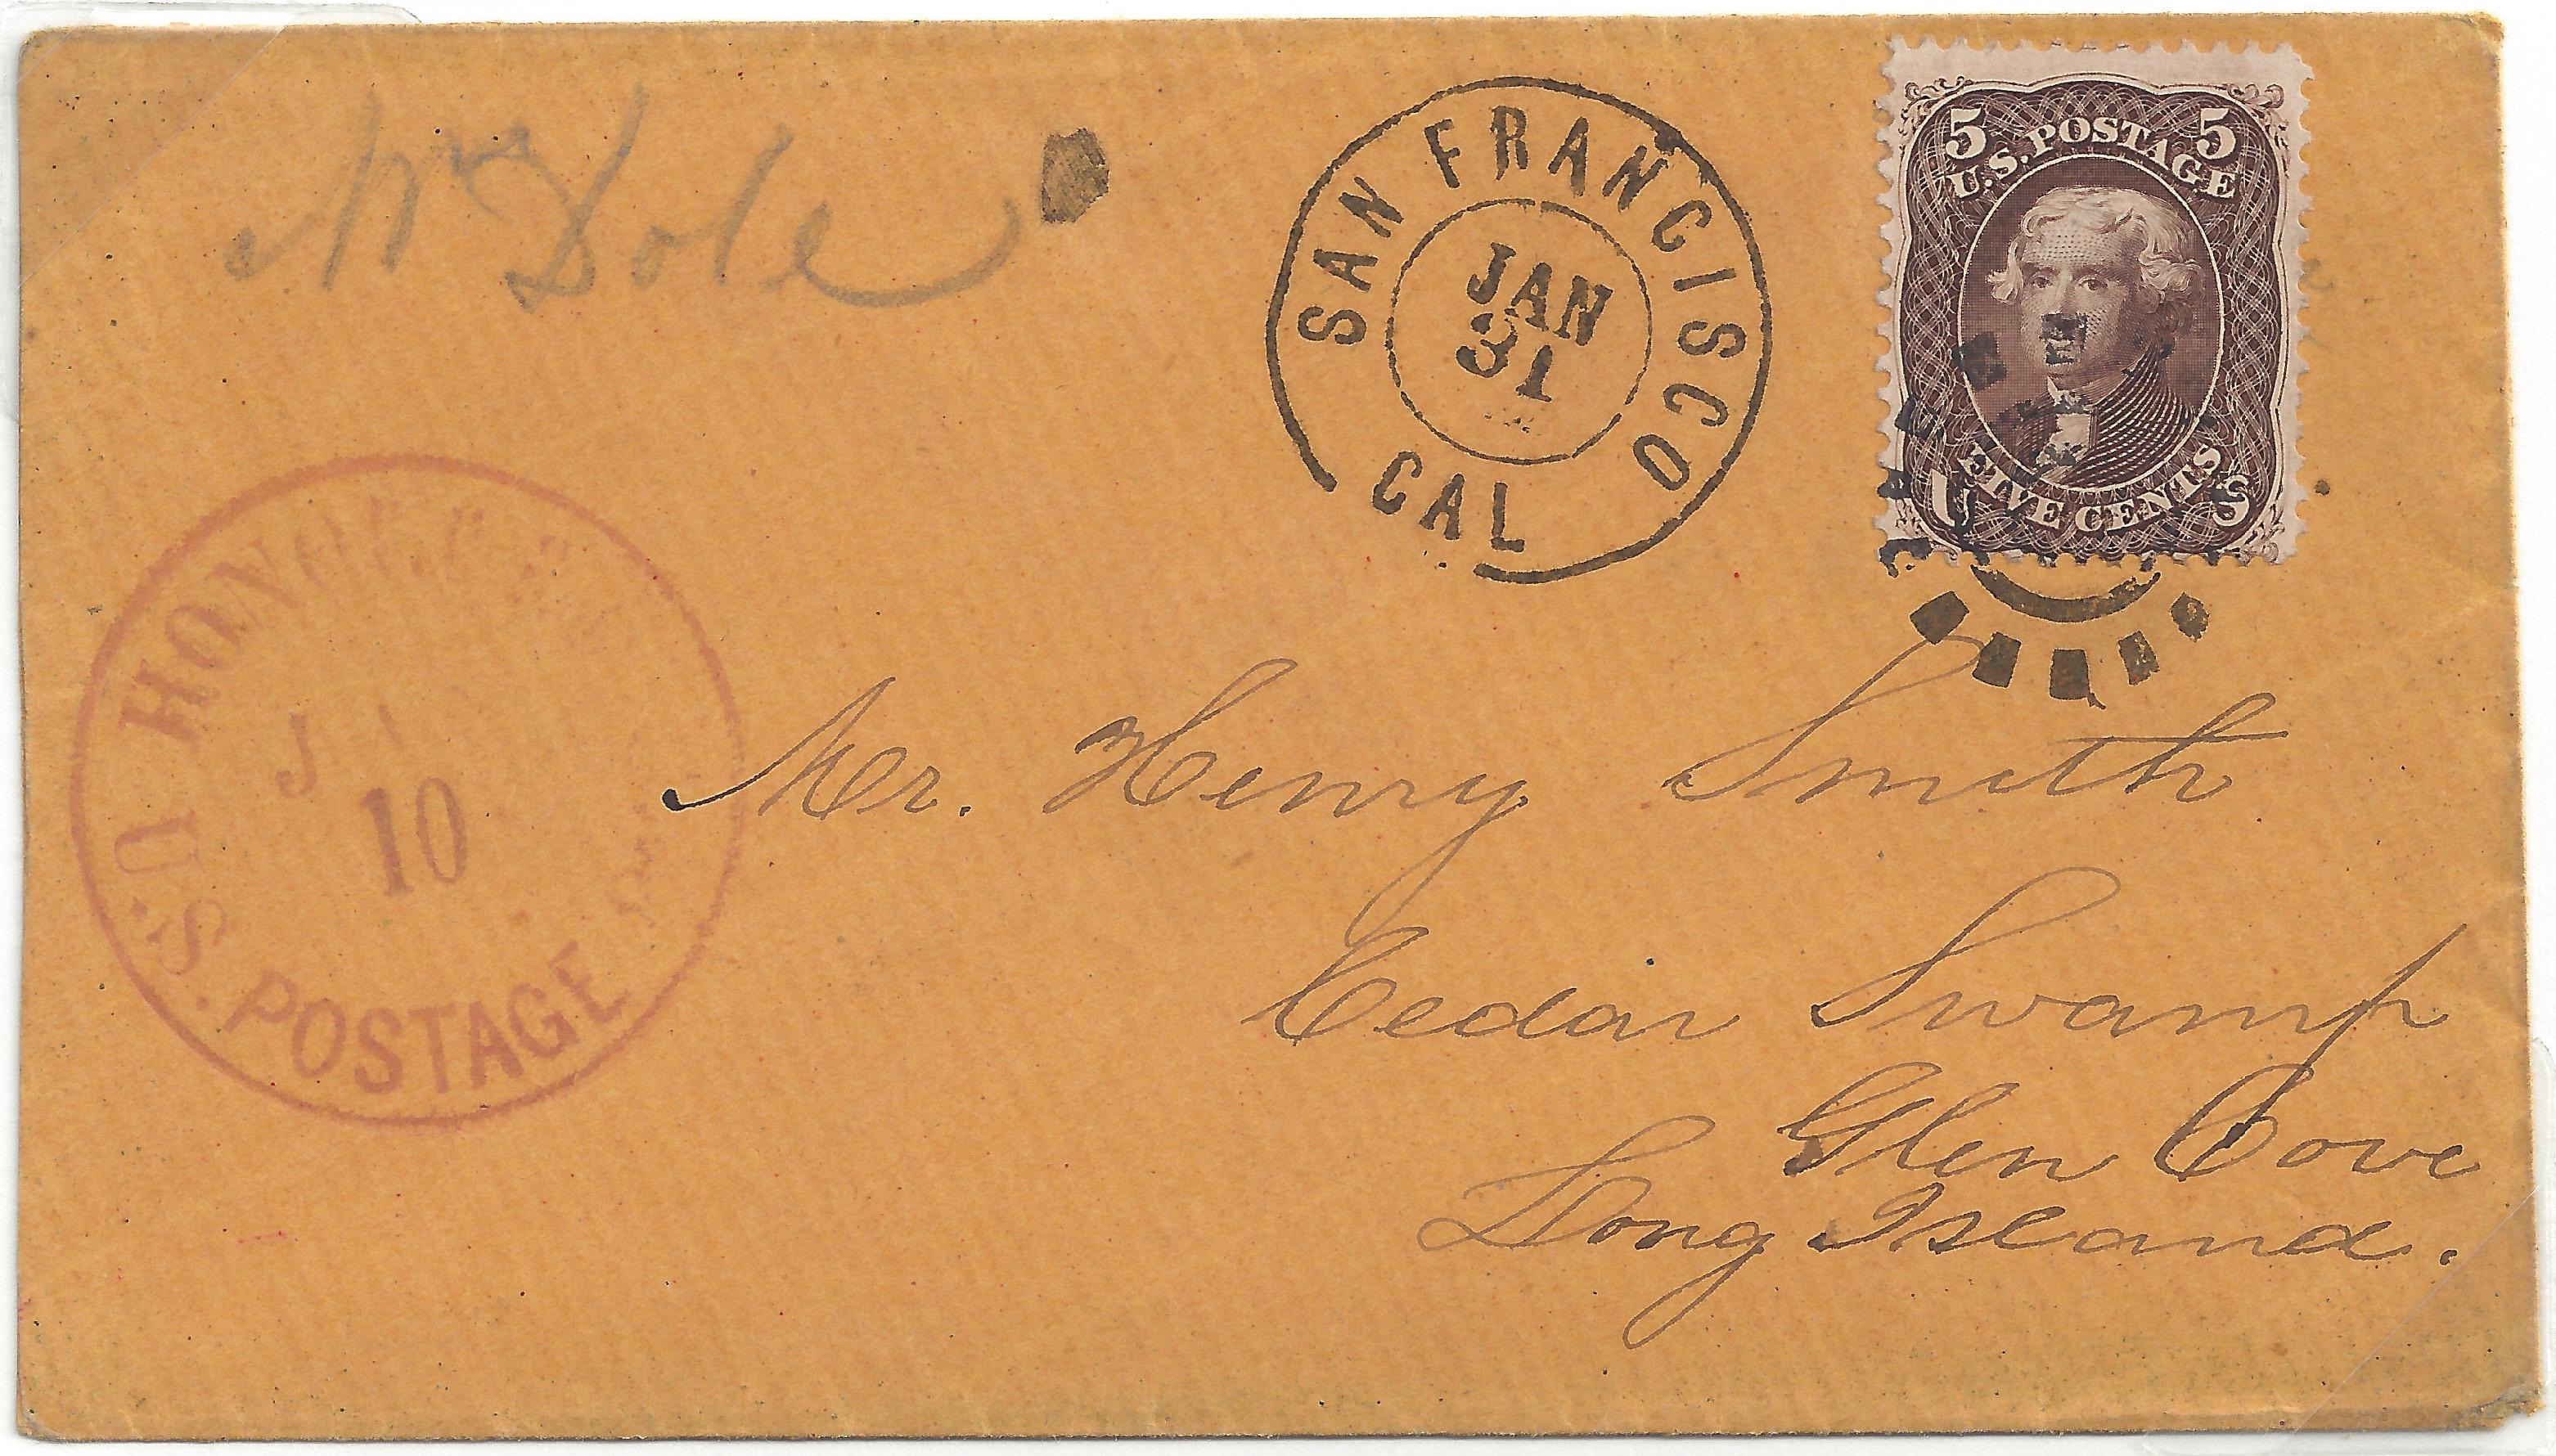 Suburban 20140525 5 014 Honolulu Jan 10, 66 Haw Postage In Cash (76)